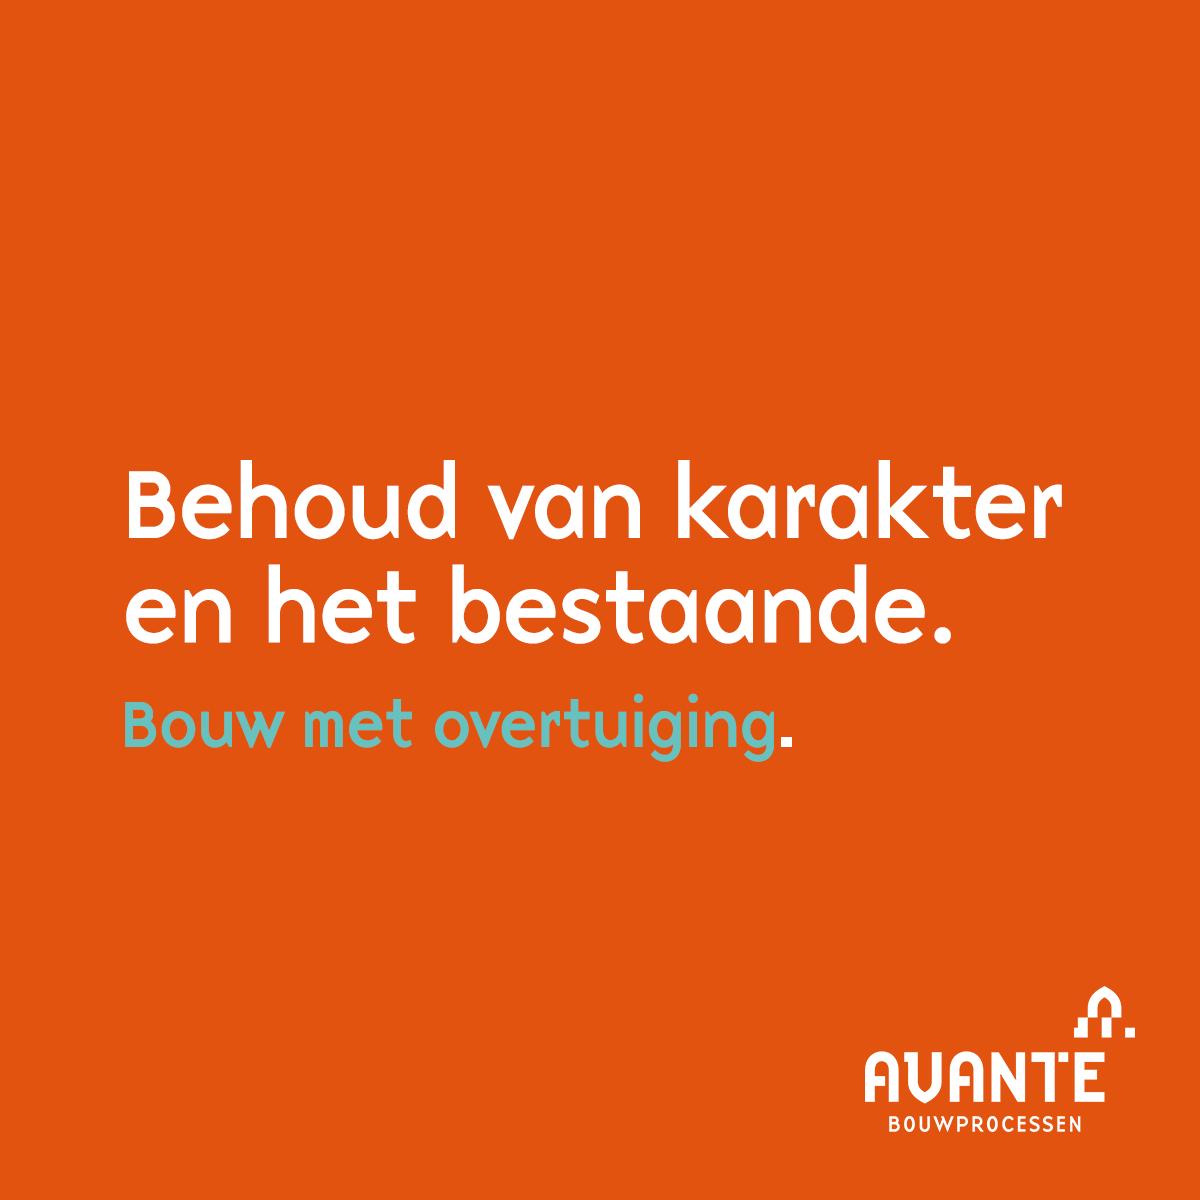 Koning Willem- Alexander opent het TechMed Centre